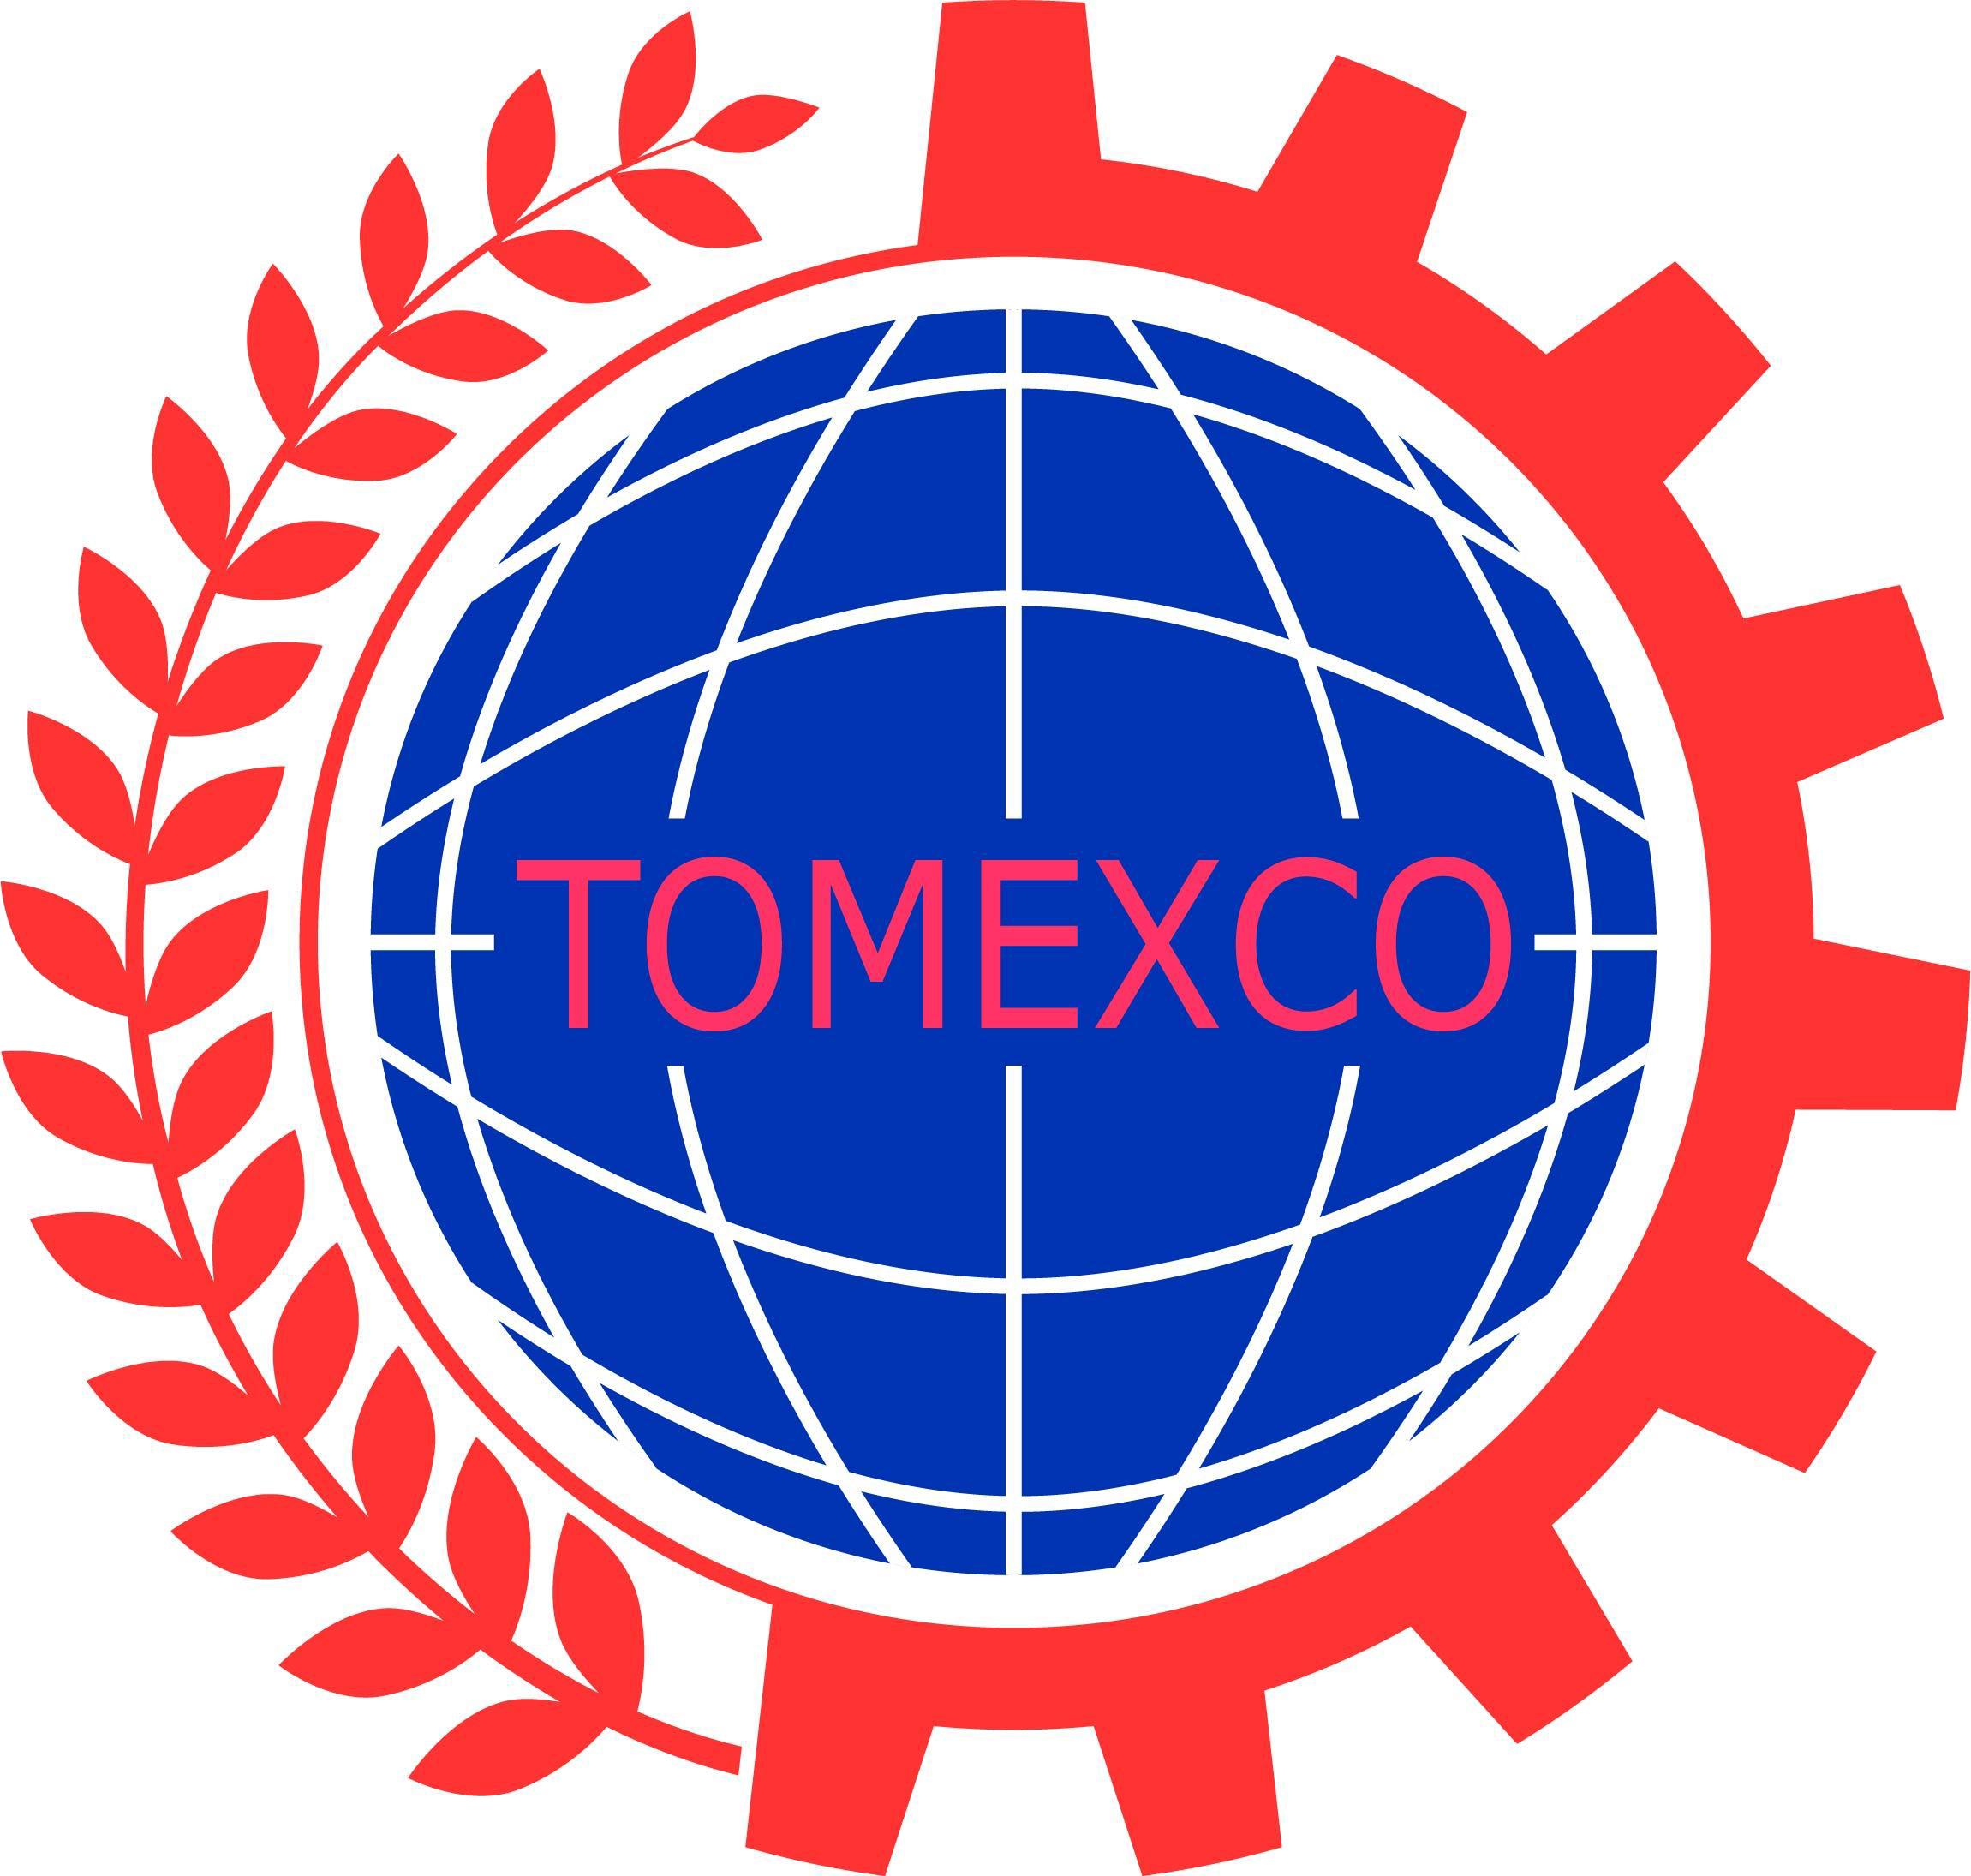 TOMEXCO